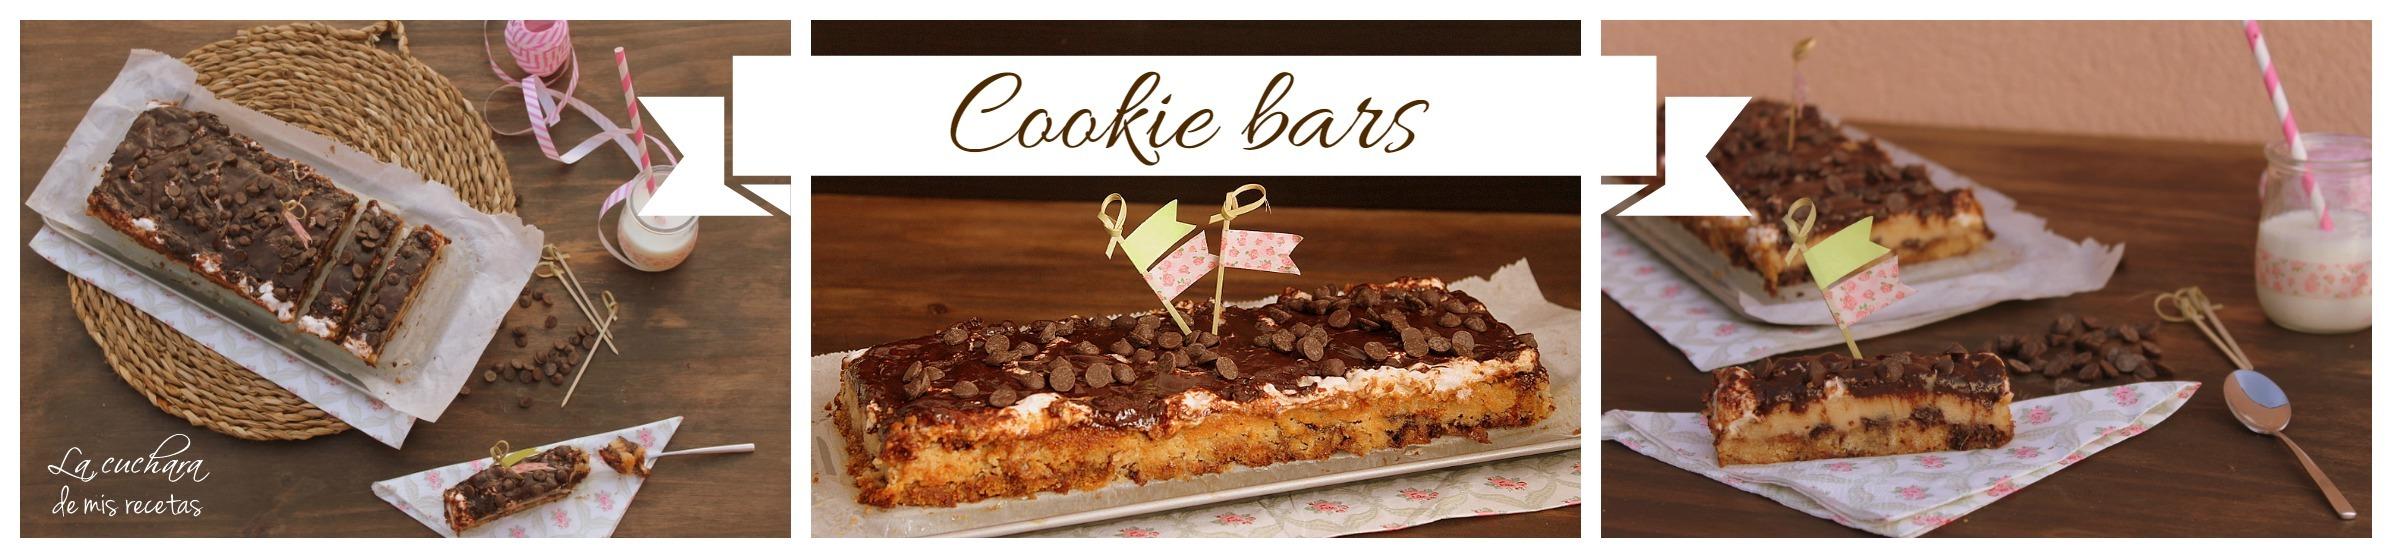 cookiebars2